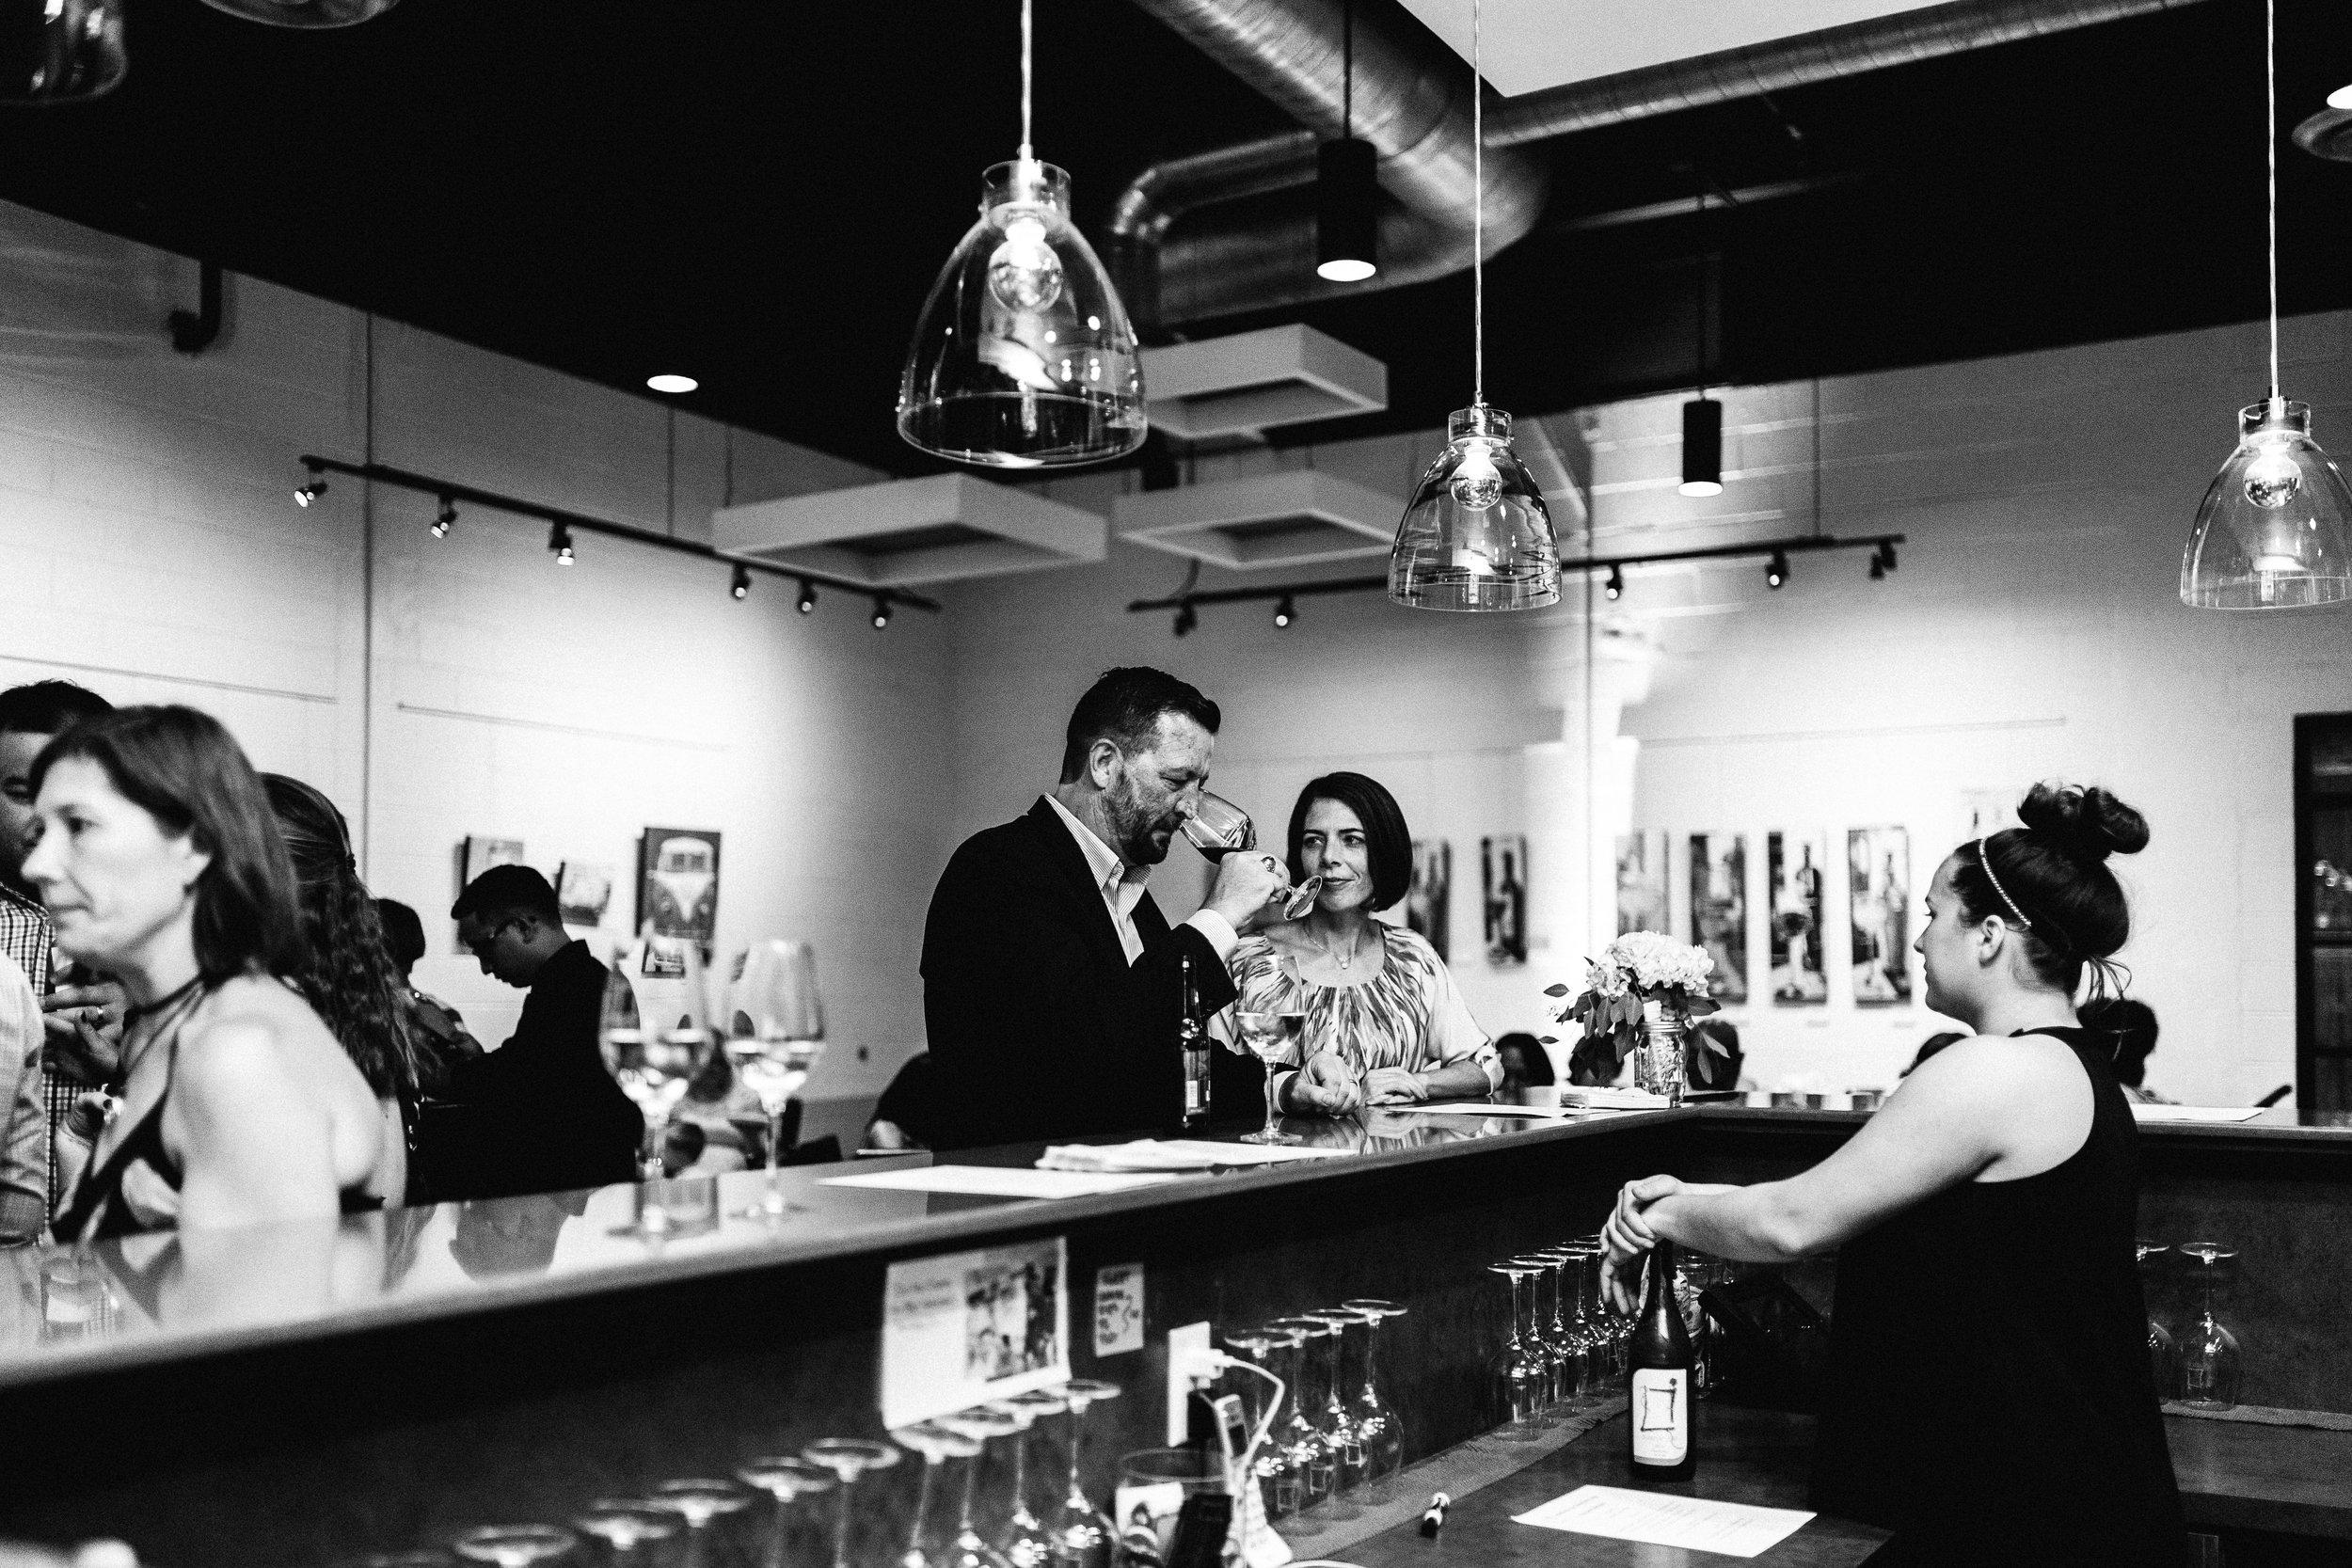 2017.09.16 Ashley and Chuck O'Day Quantam Leap Winery Wedding (373 of 462).jpg